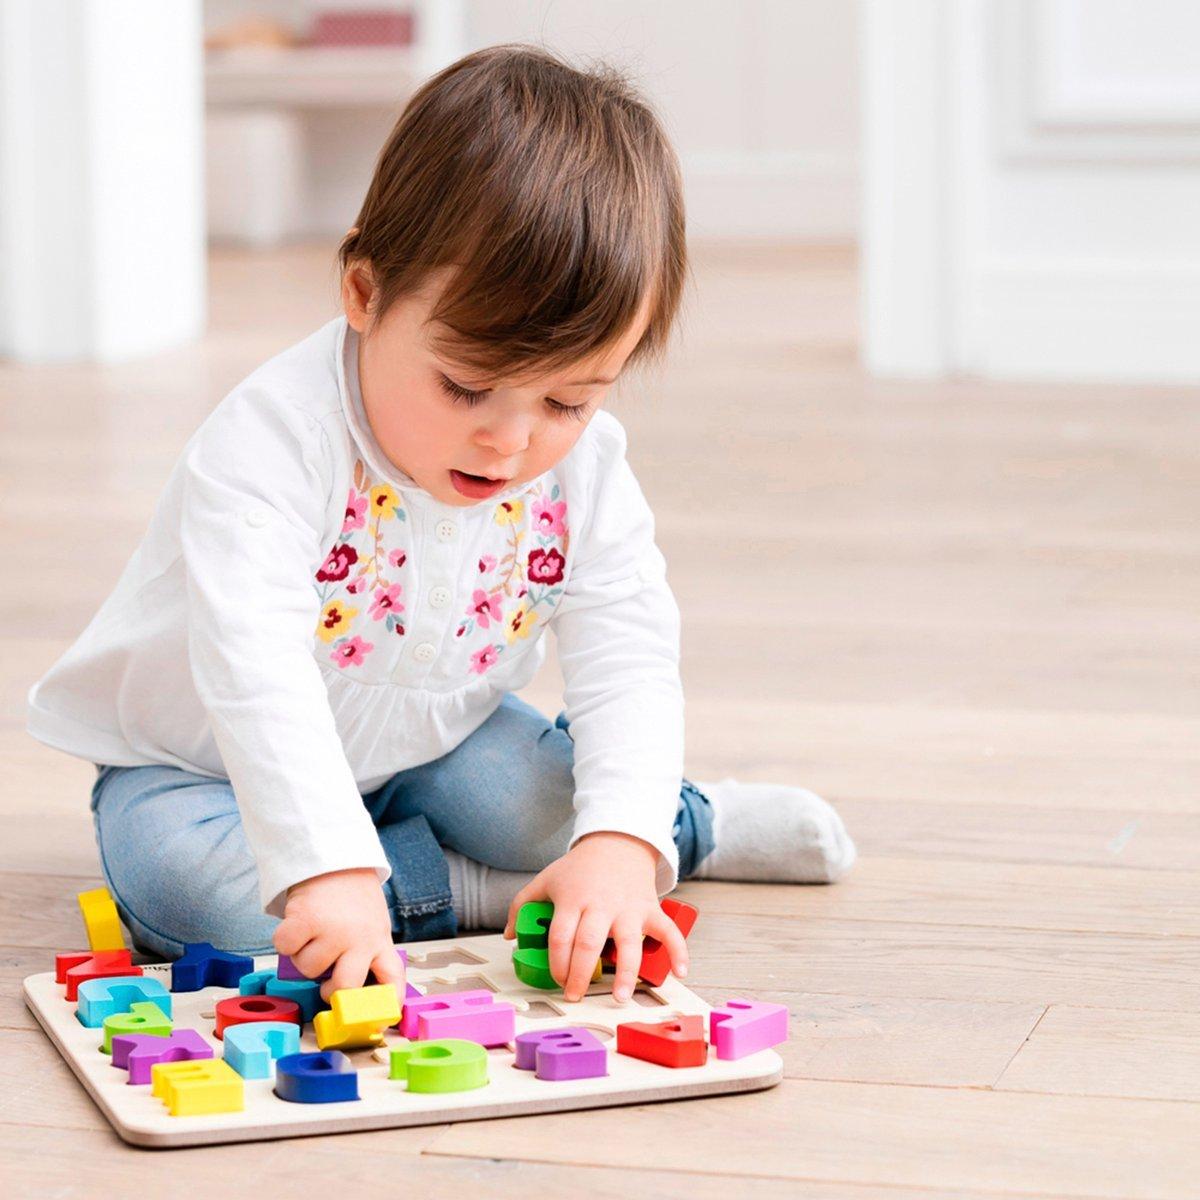 Baby Puzzle Spiele Holzspielzeug solini ABC Buchstaben 26-tlg ab 18 Monate bunt neu